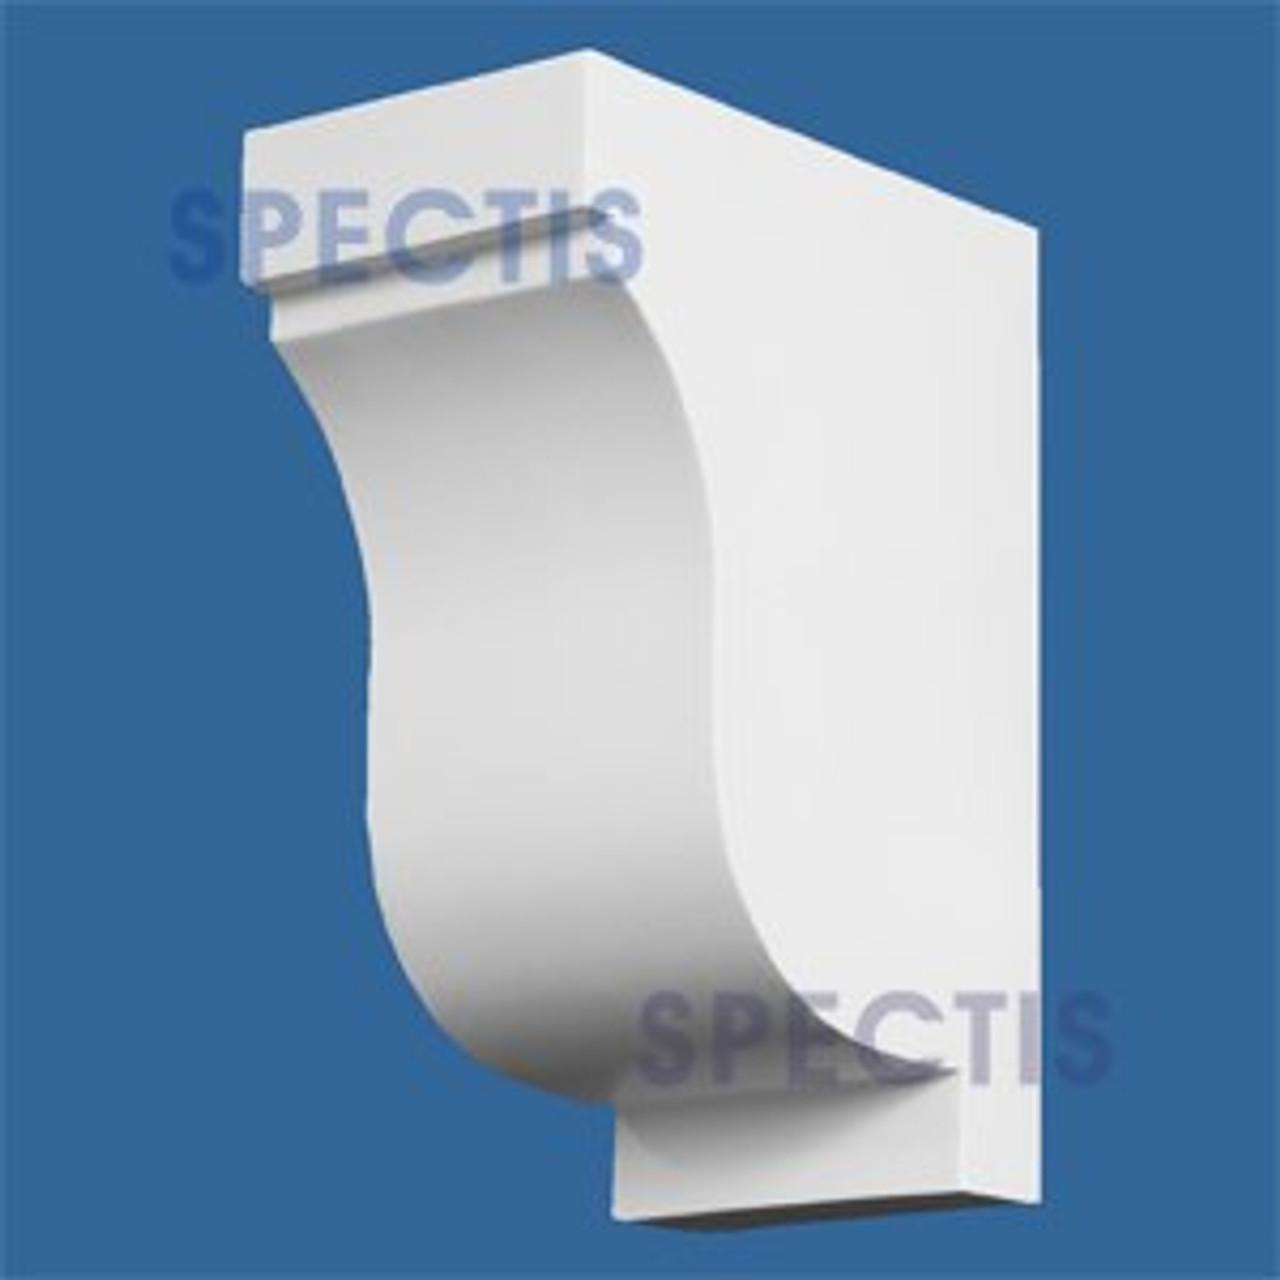 "BL2670 Corbel Block or Eave Bracket 3.5""W x 8""H x 5.75"" P"